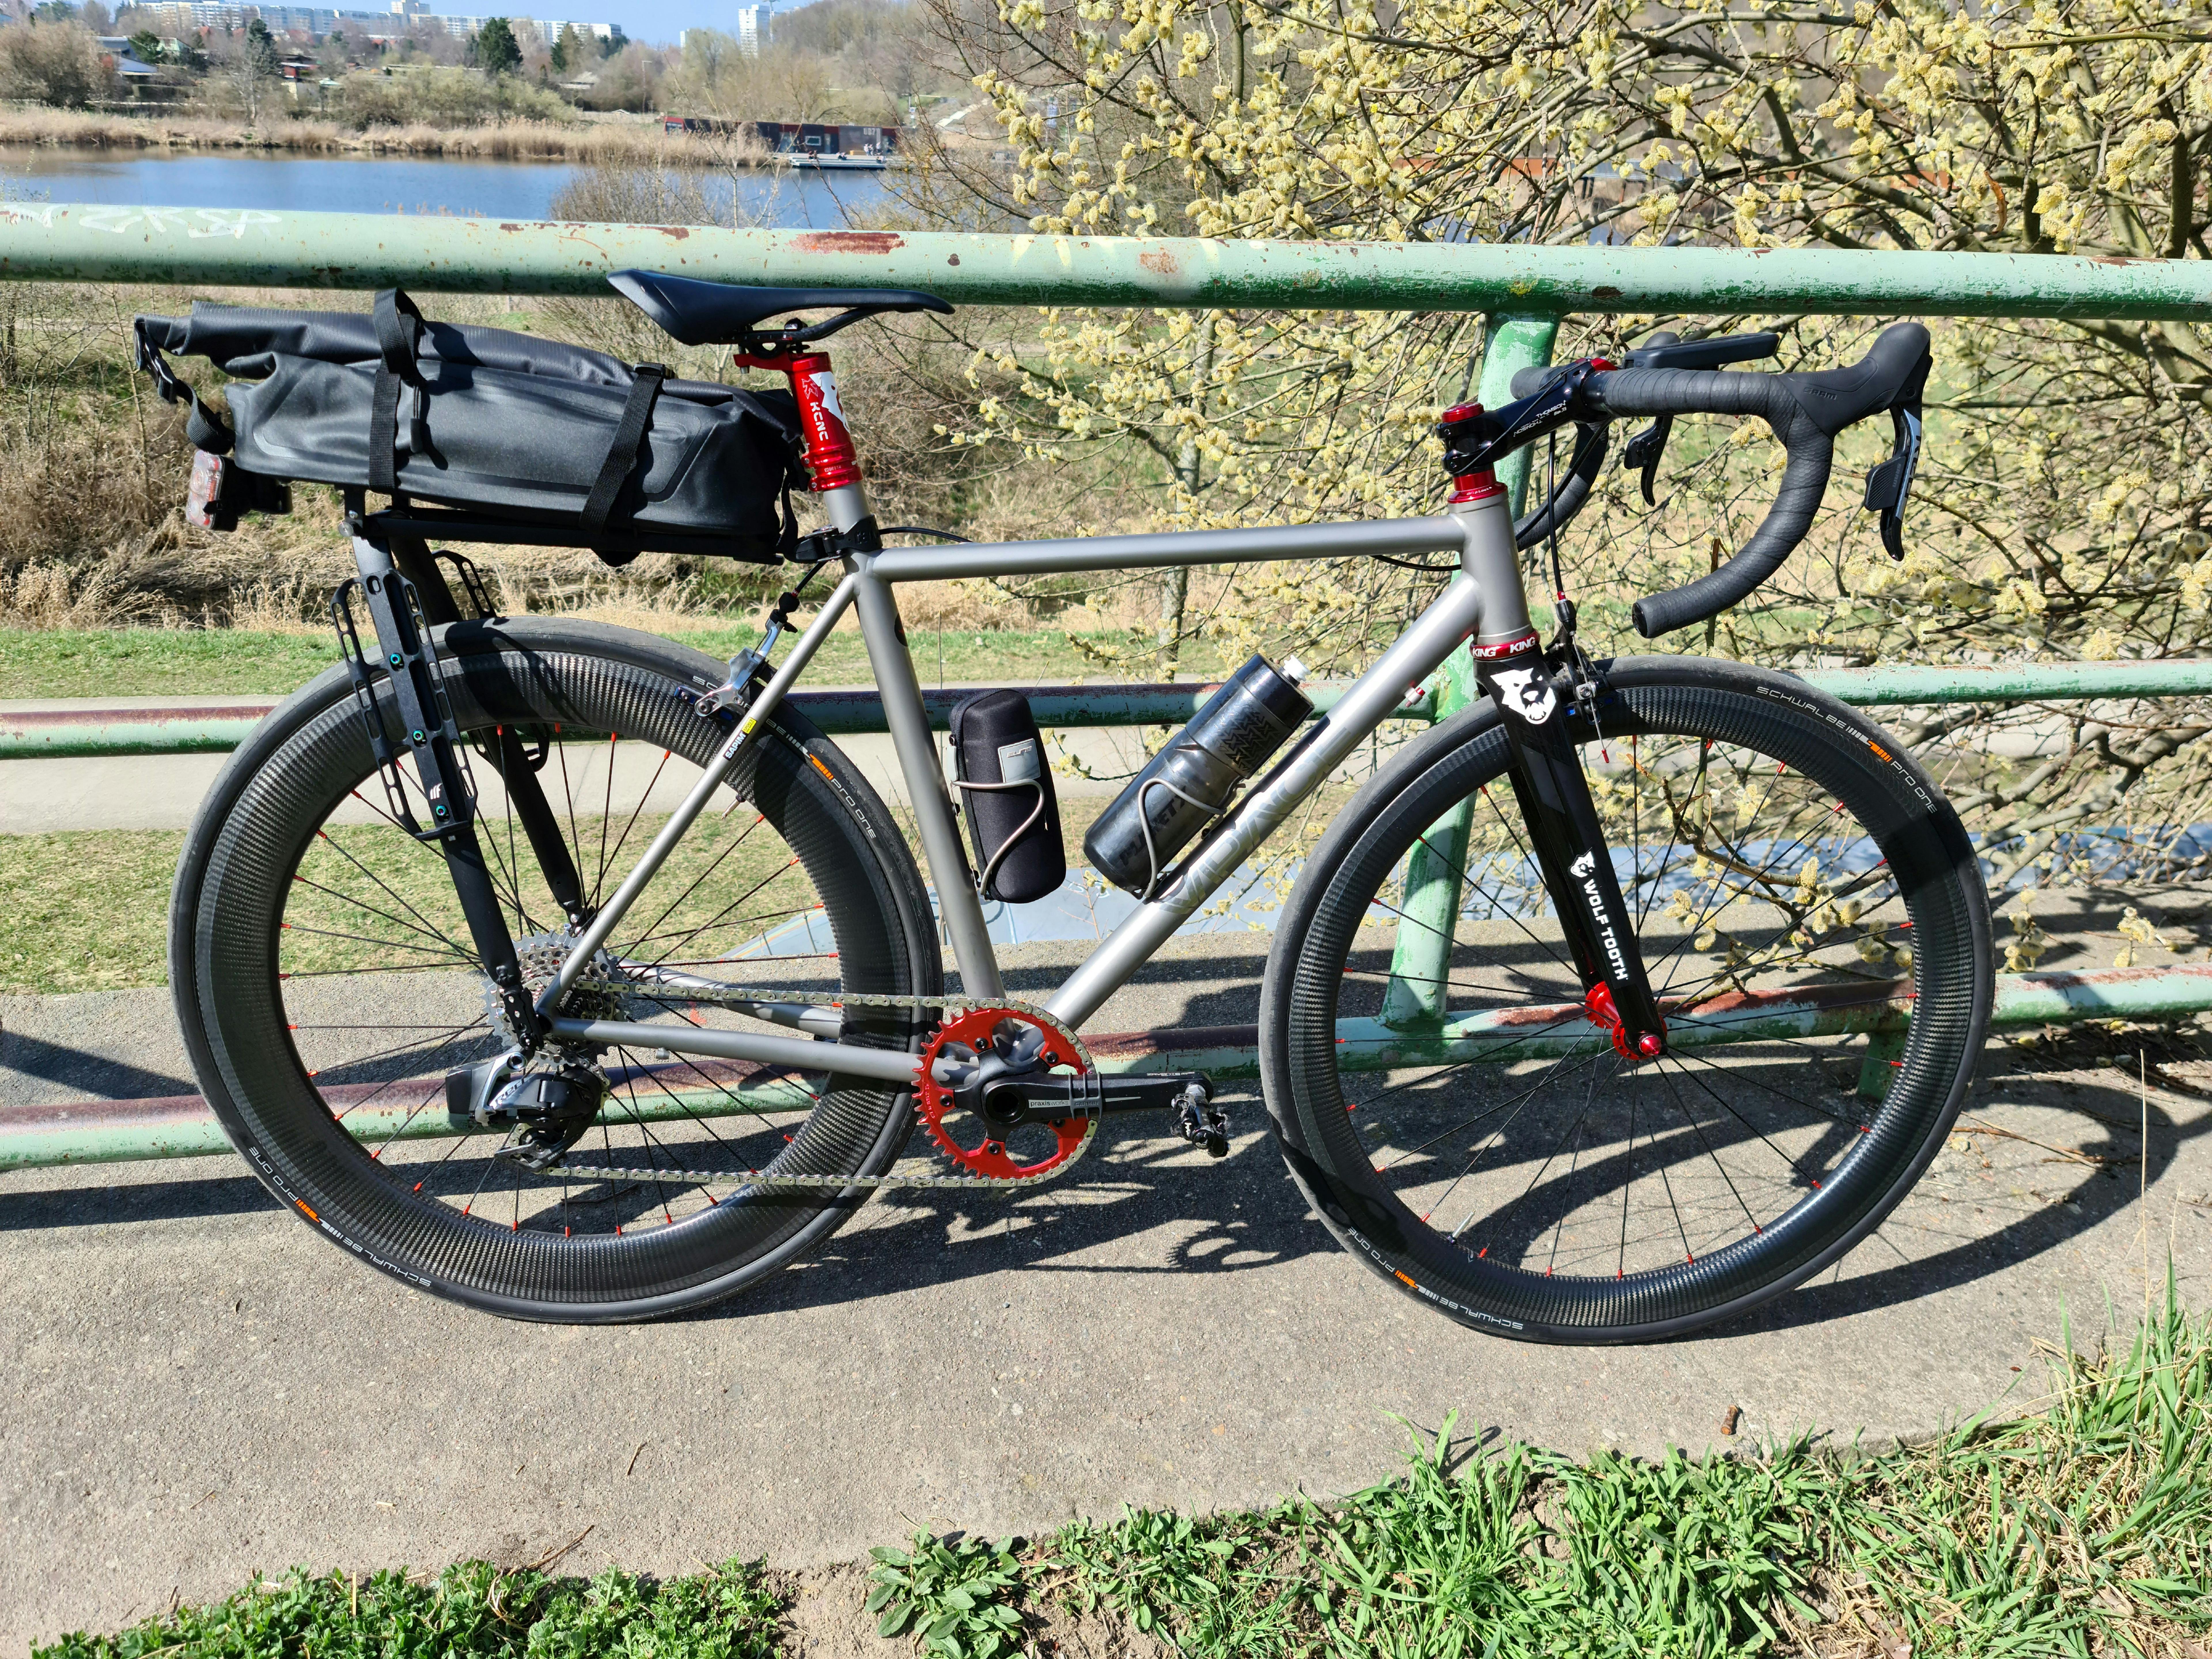 VPACE-T1R-Titanium-on-light-bicycle-r45-front-r65-rear-carbon-wheelset